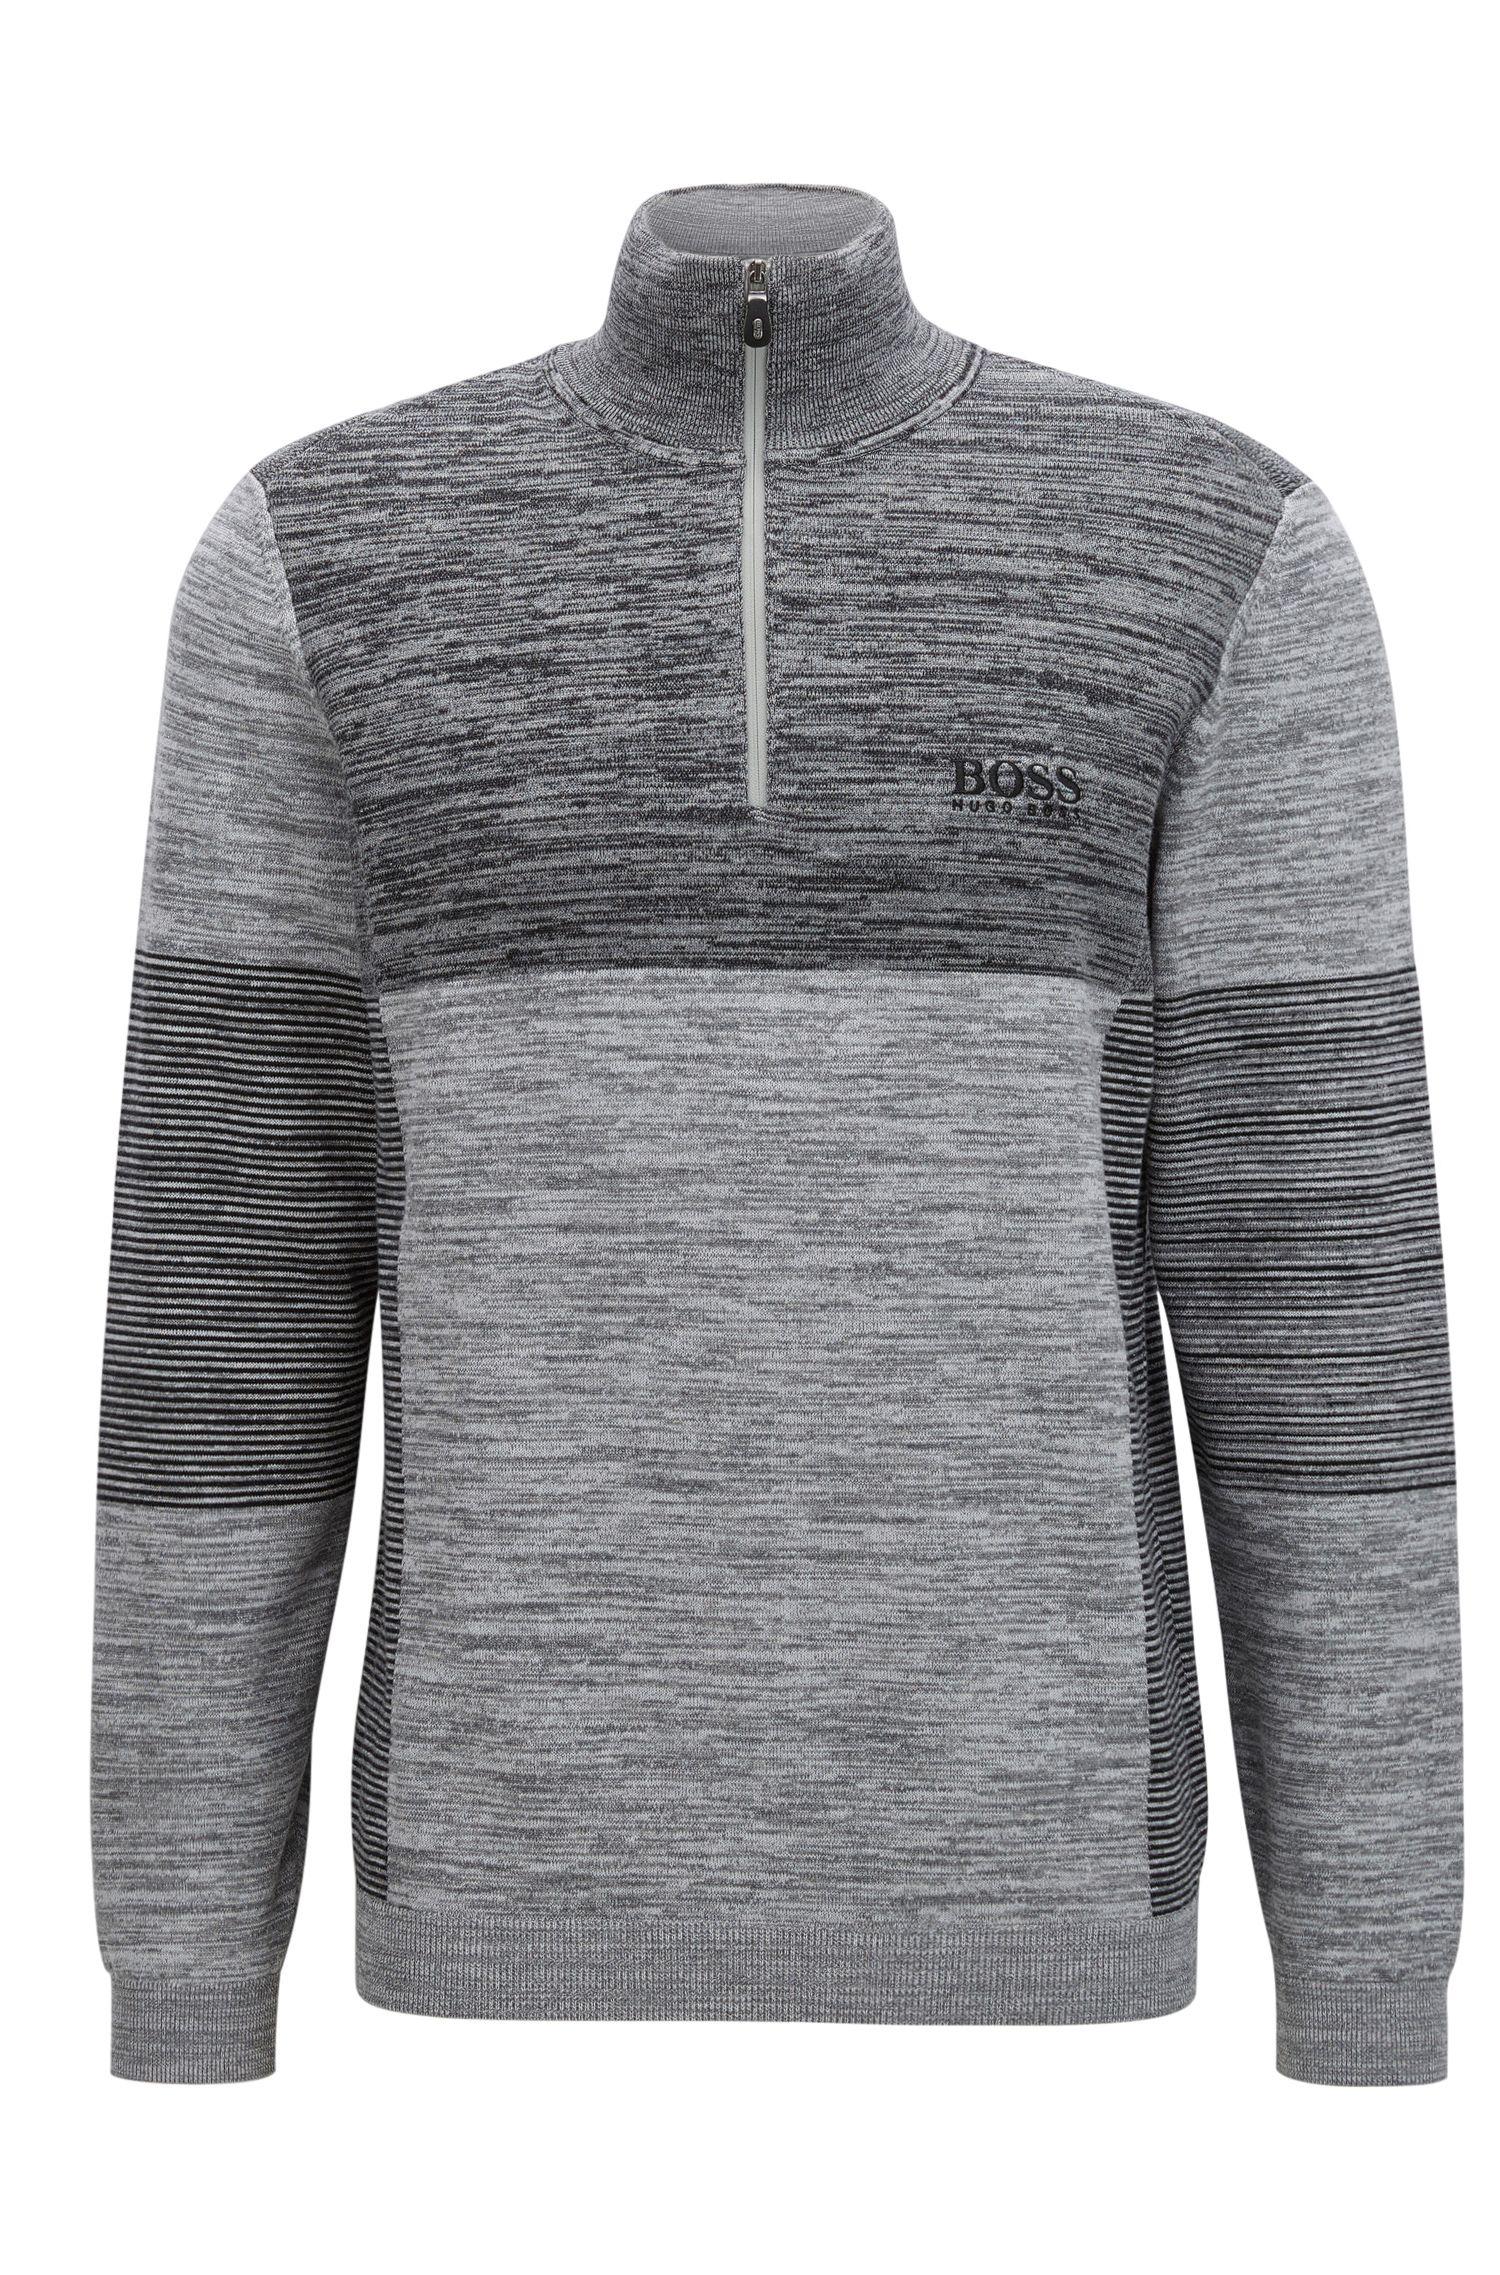 Colorblocked Melange Stretch Cotton Half-Zip Sweater   Zadok Pro